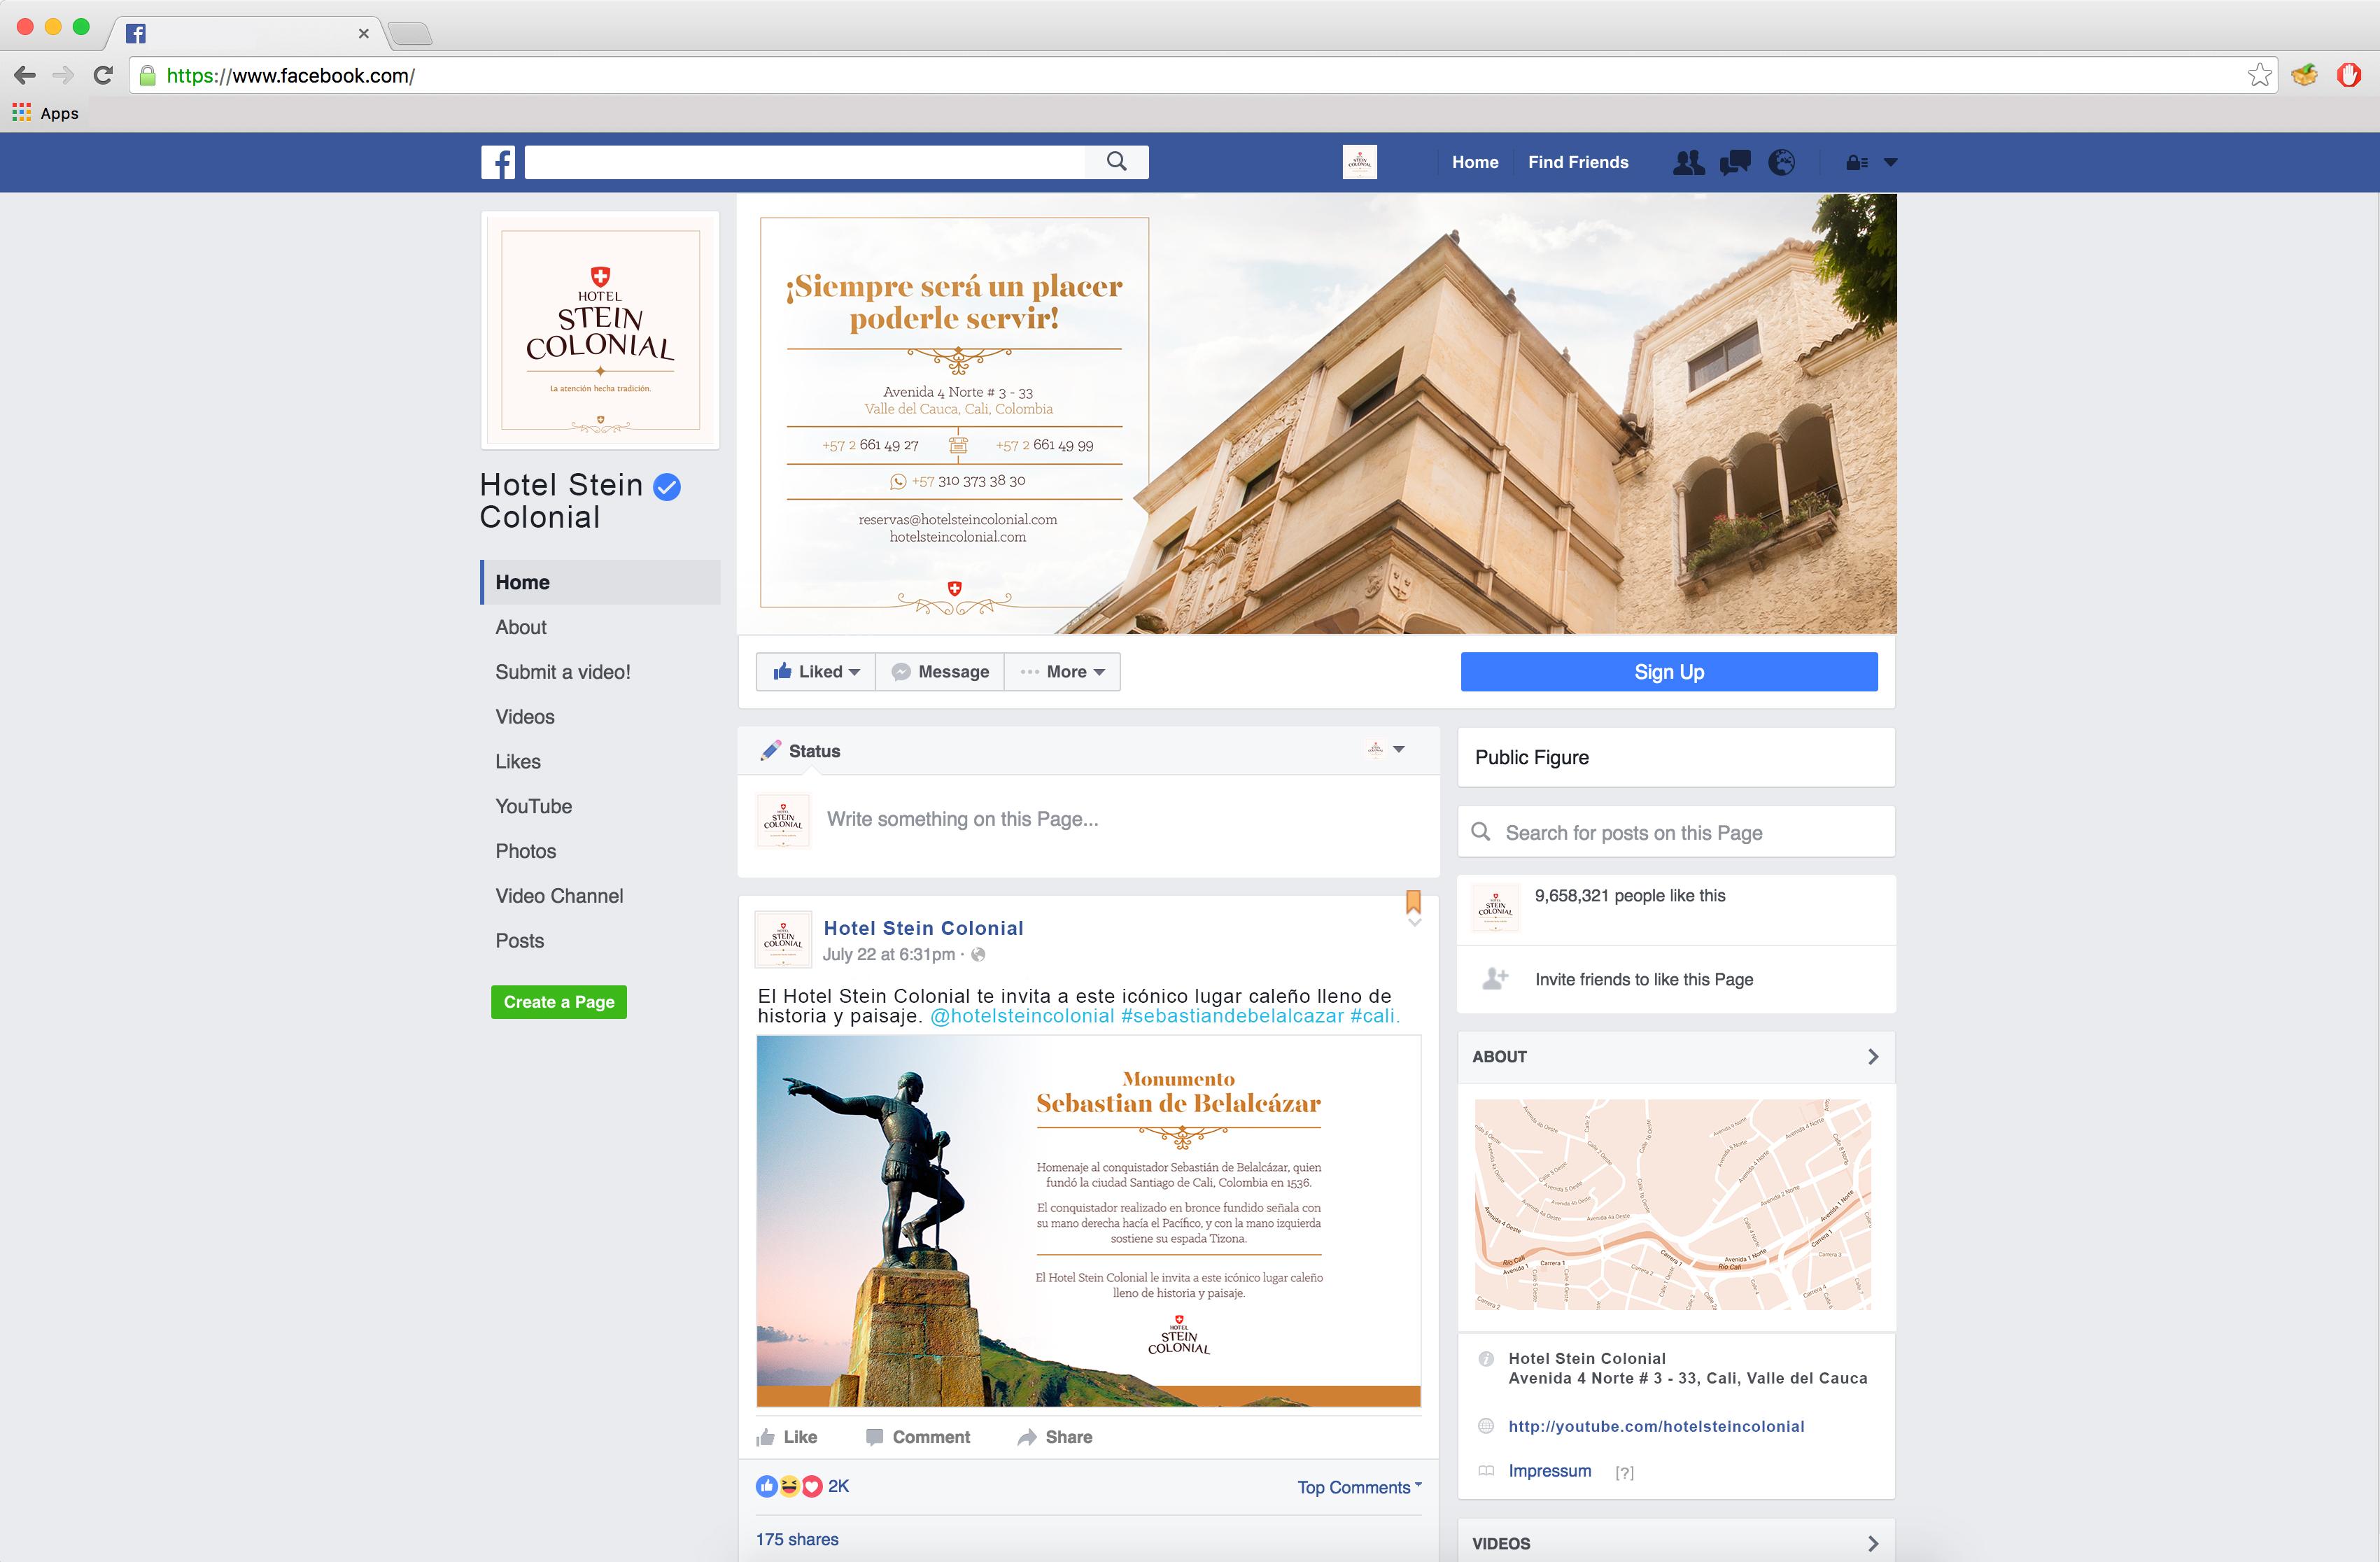 17_05_12_Muestra_Facebook_Hotel_Stein_Colonial